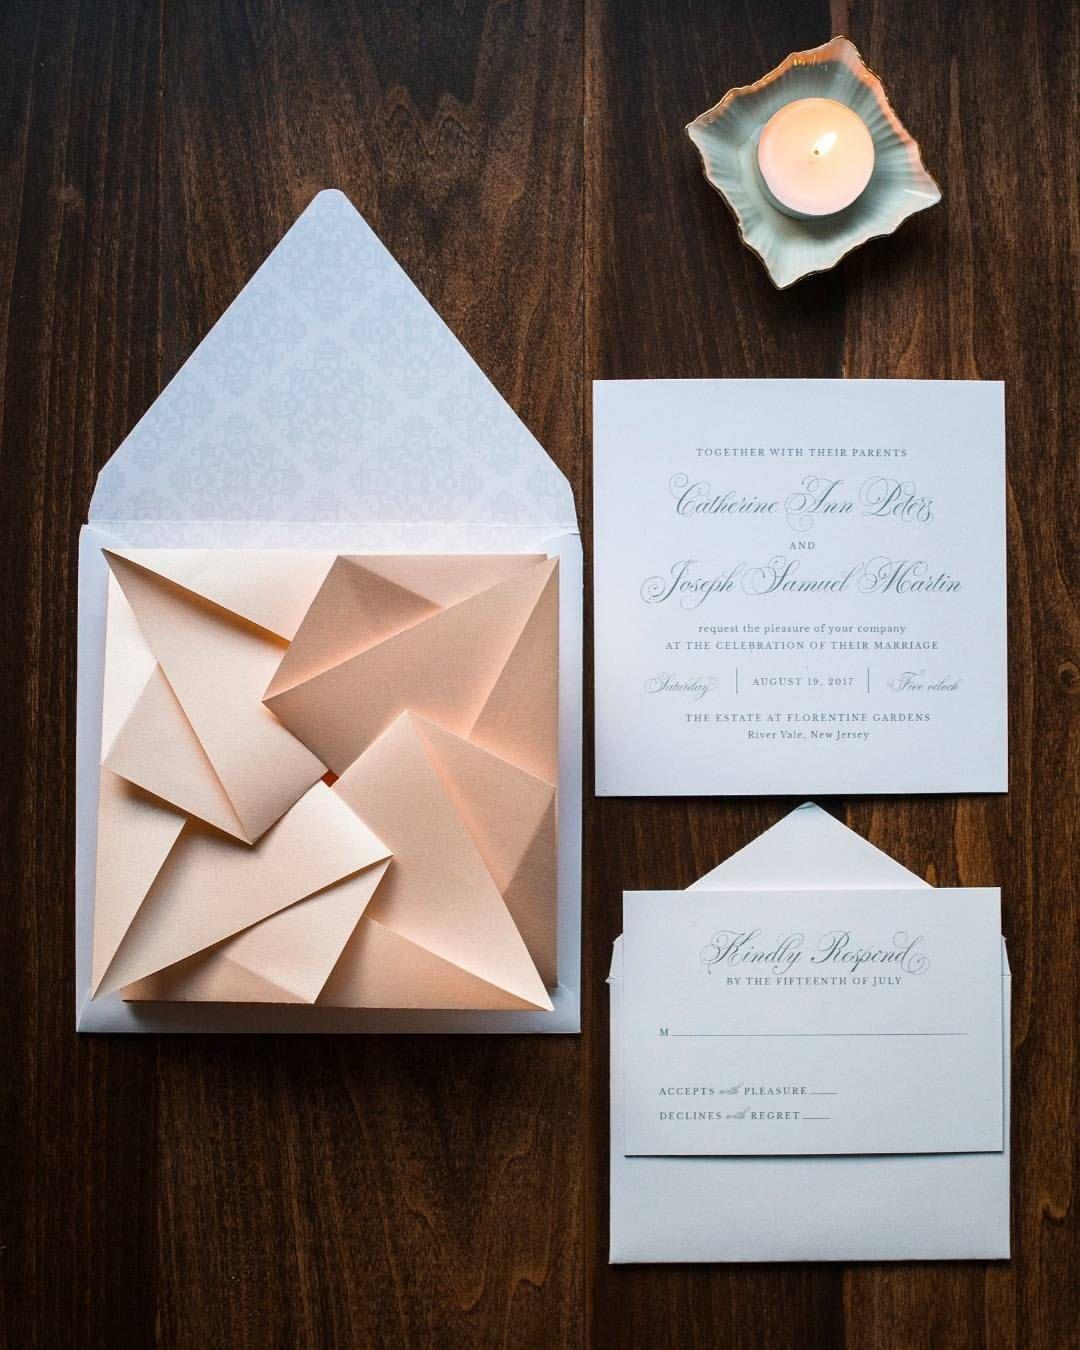 custom wedding invitations new york city%0A business analyst resume samples